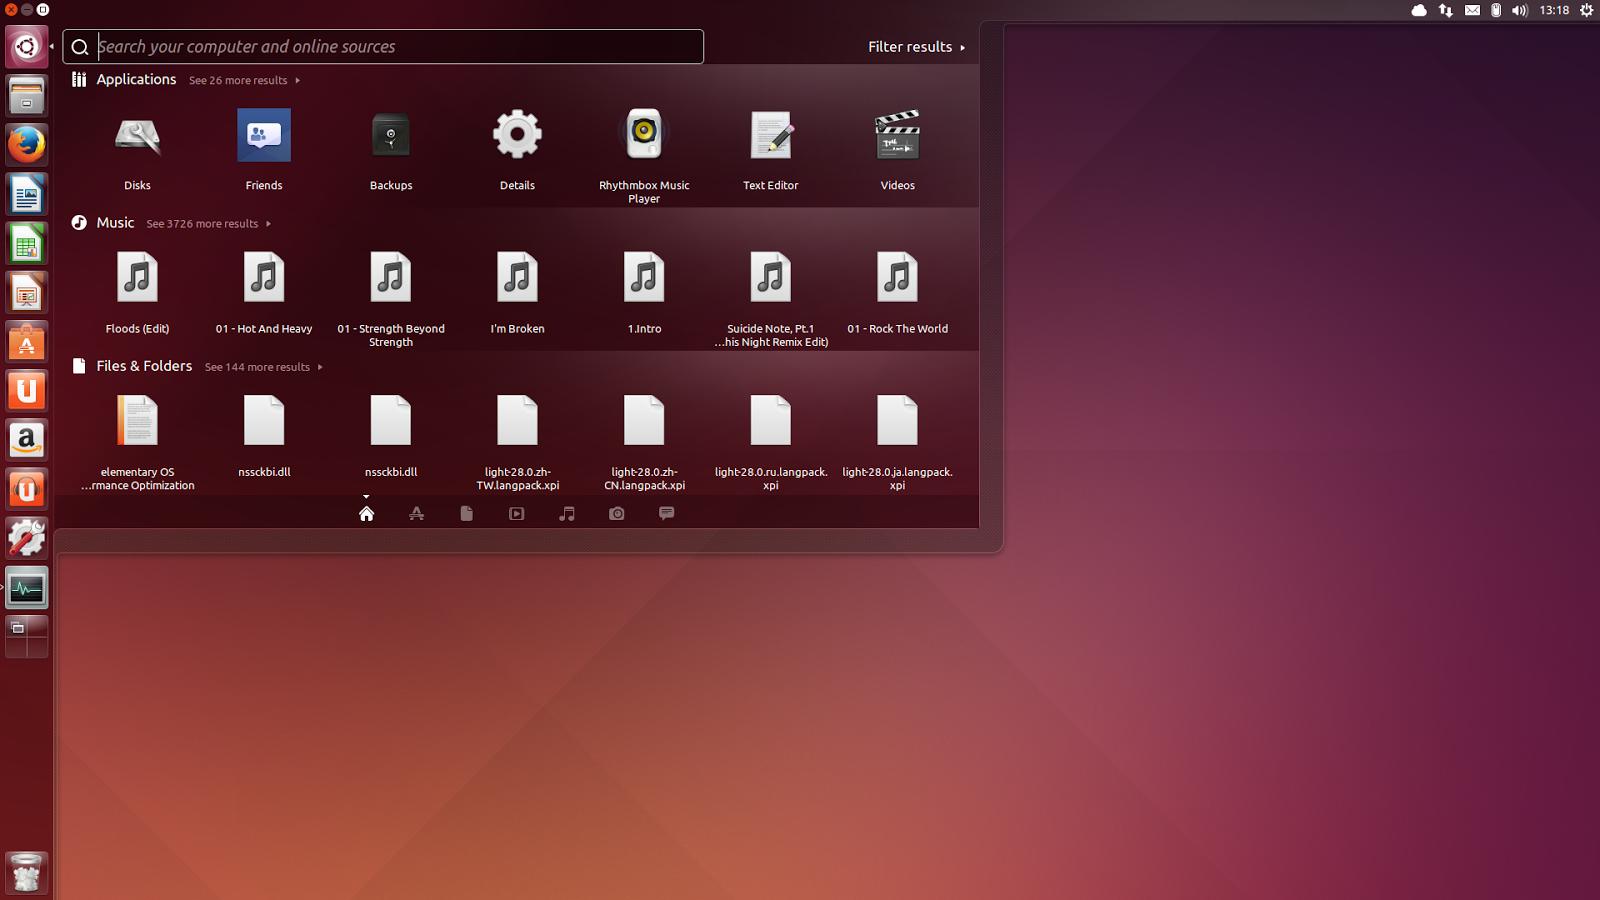 http://2.bp.blogspot.com/-GqveVKiyJPg/U0-cPr1DqUI/AAAAAAAASRo/qe6alekGyIA/s1600/ubuntu14.04-unity.png